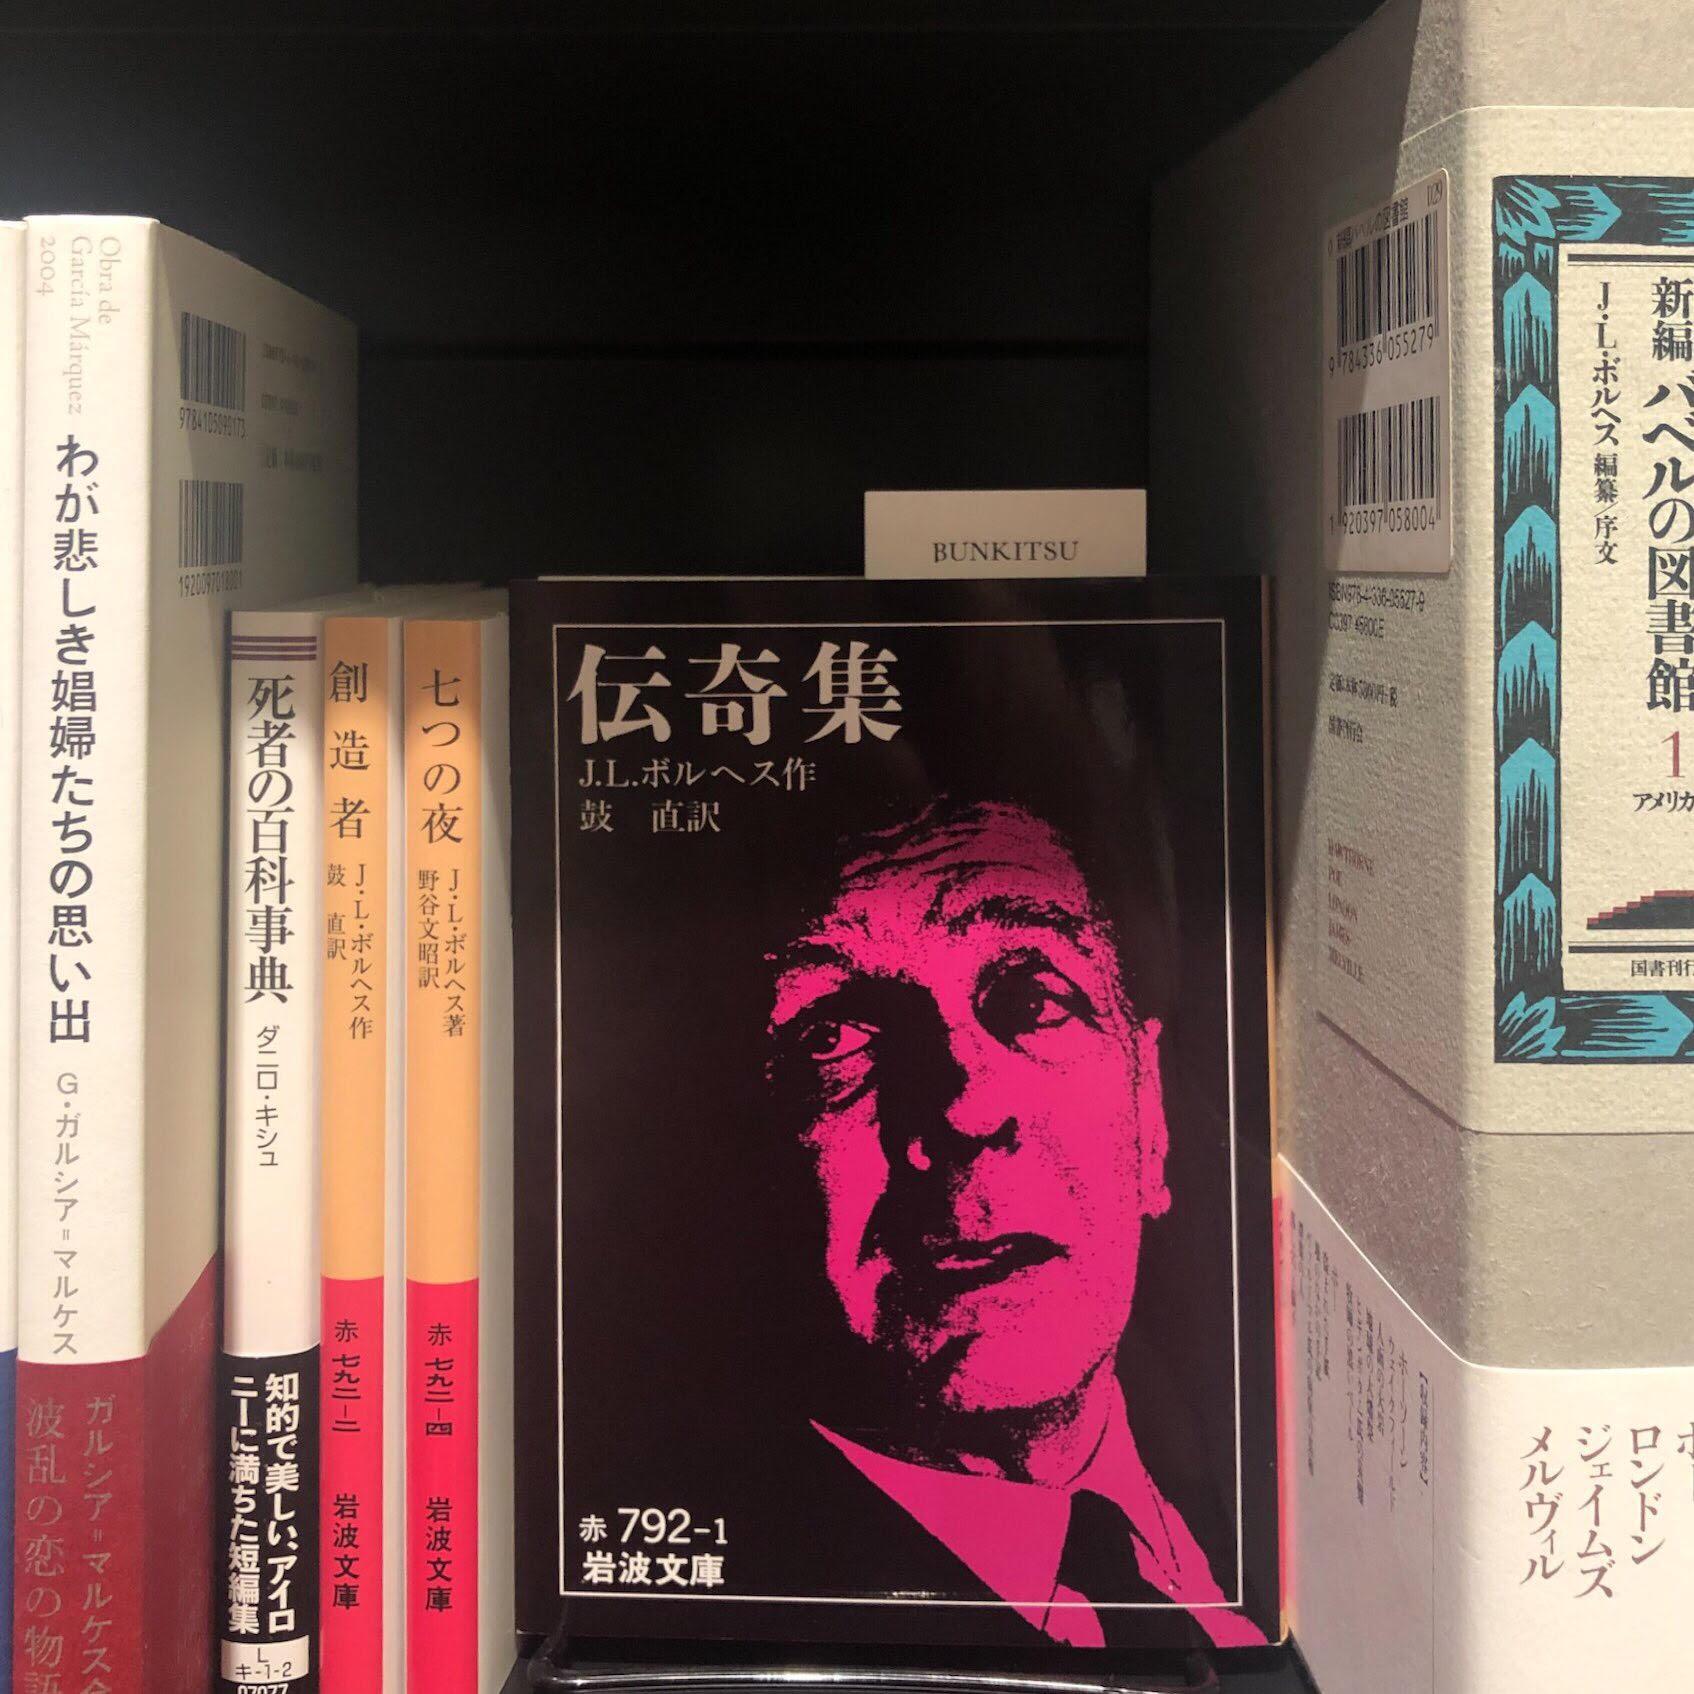 J.L.ボルヘス『伝奇集』(岩波書店)